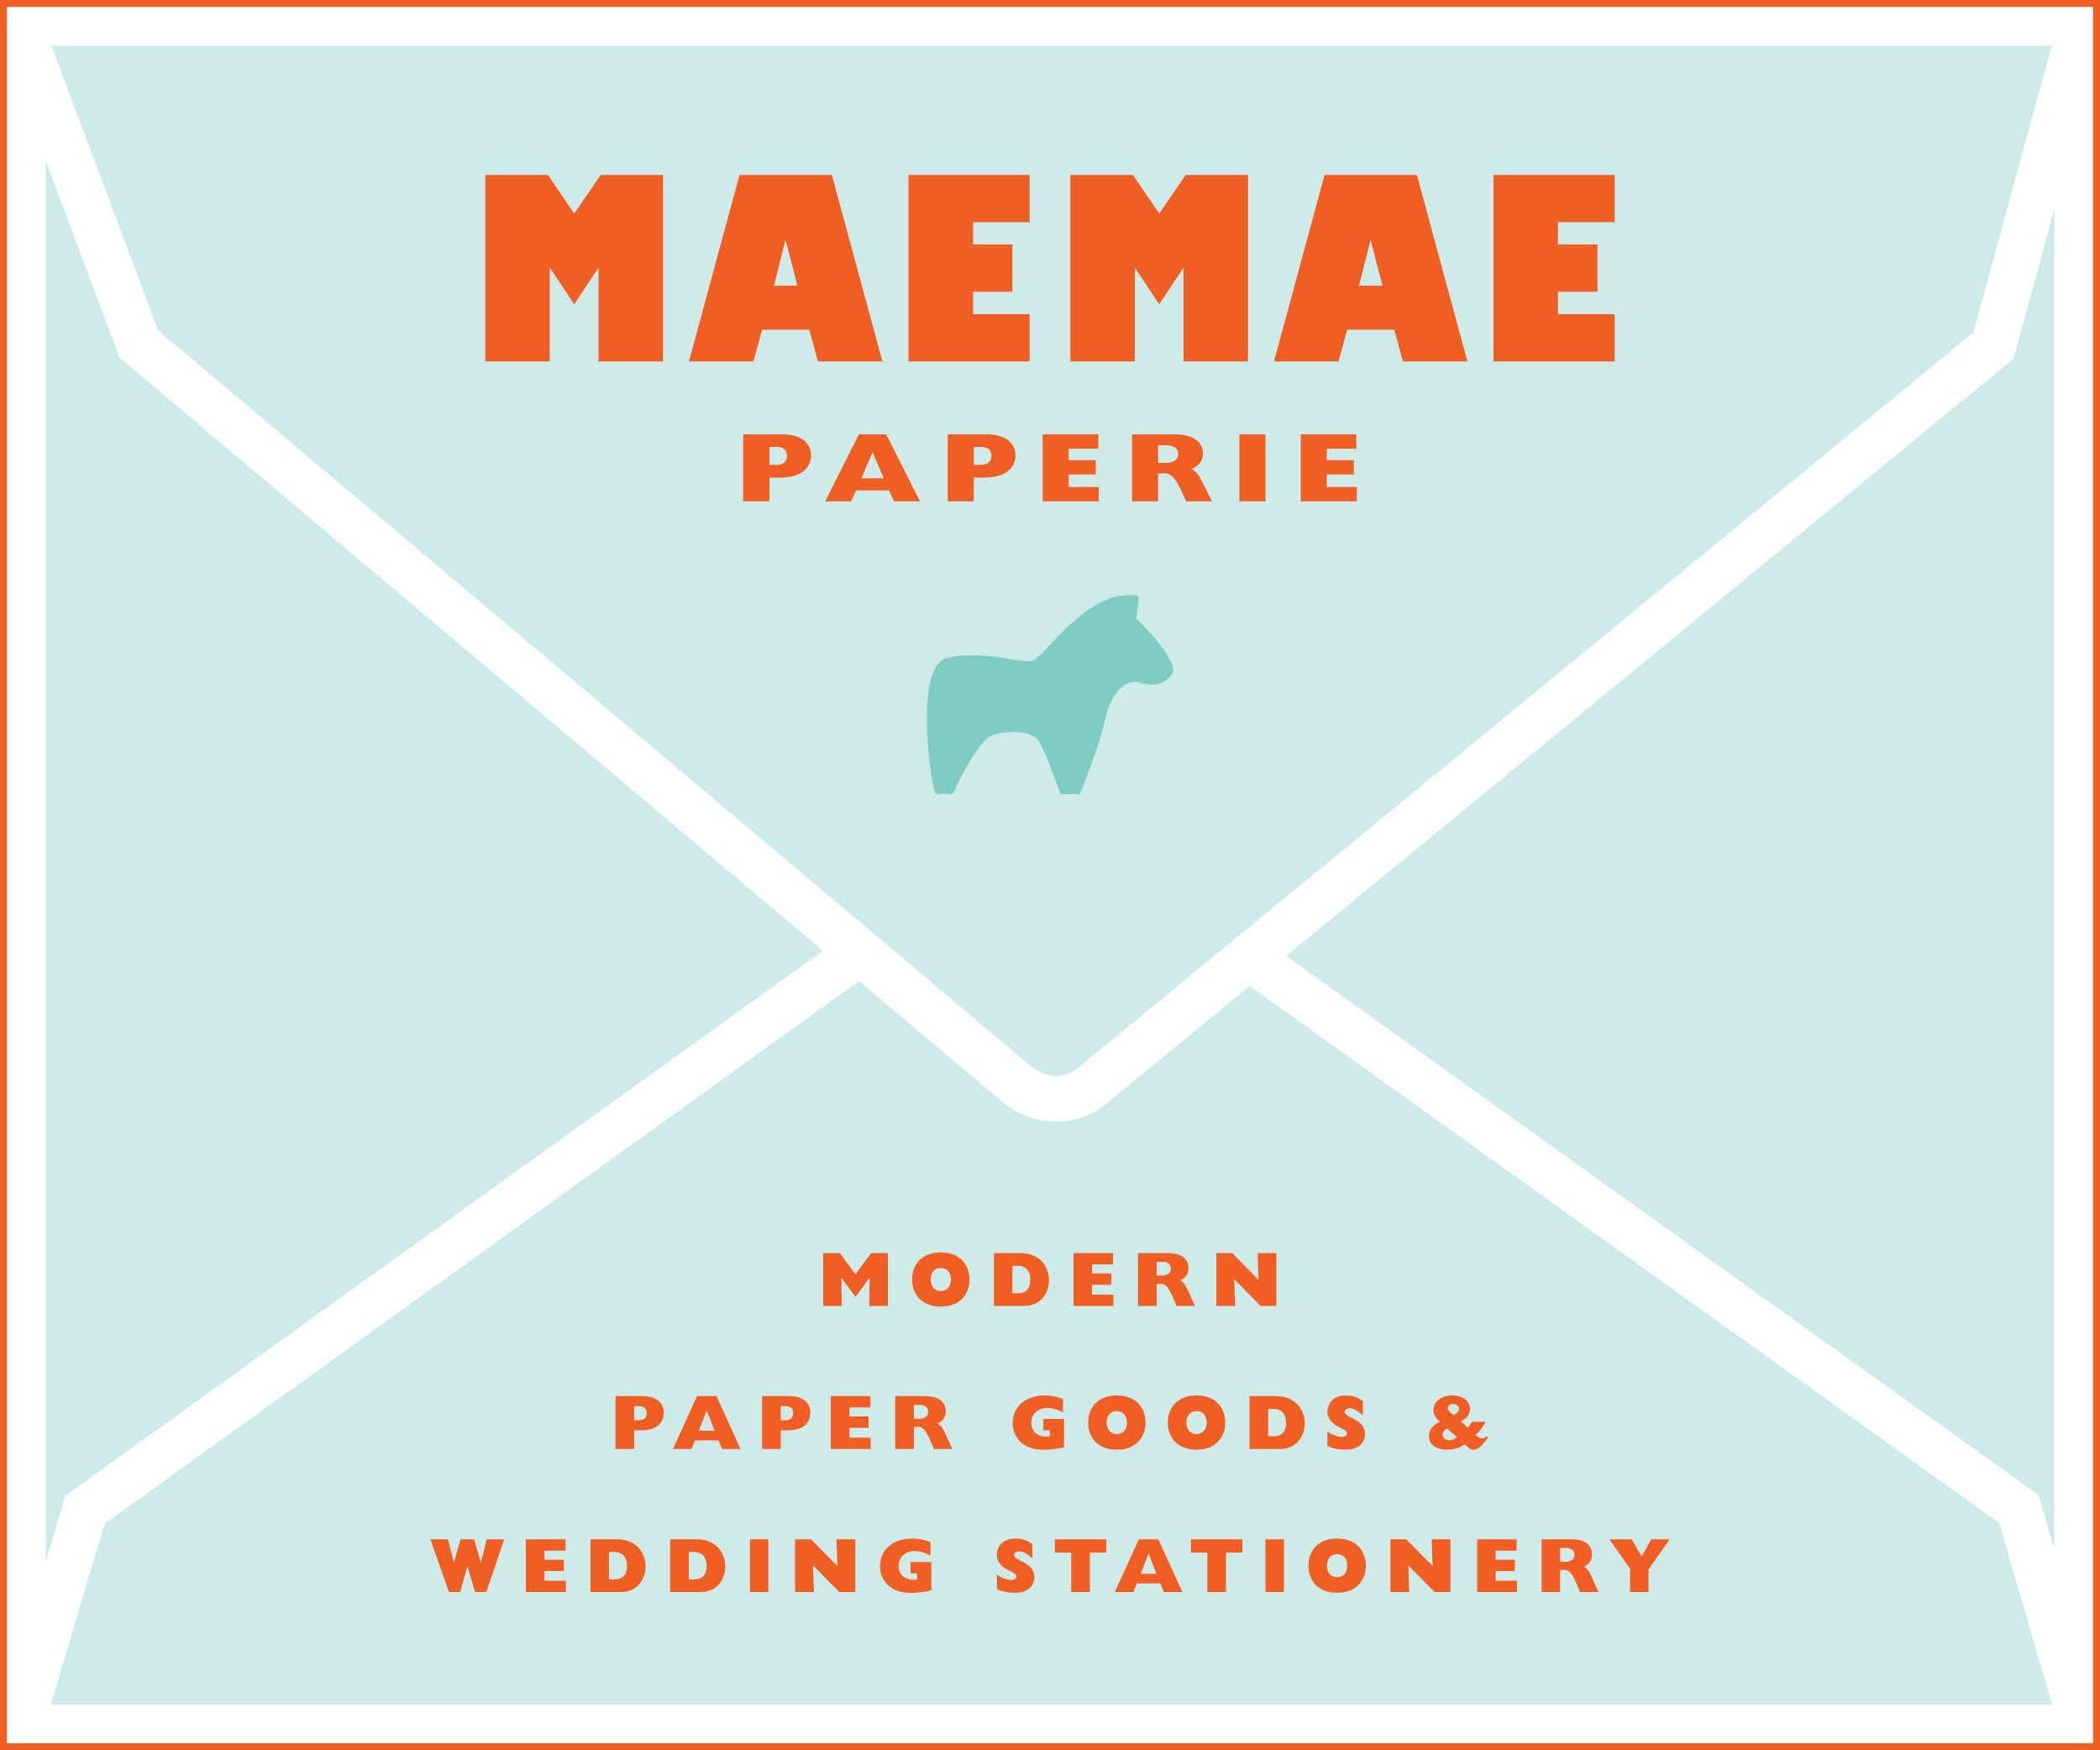 MaeMaepaper